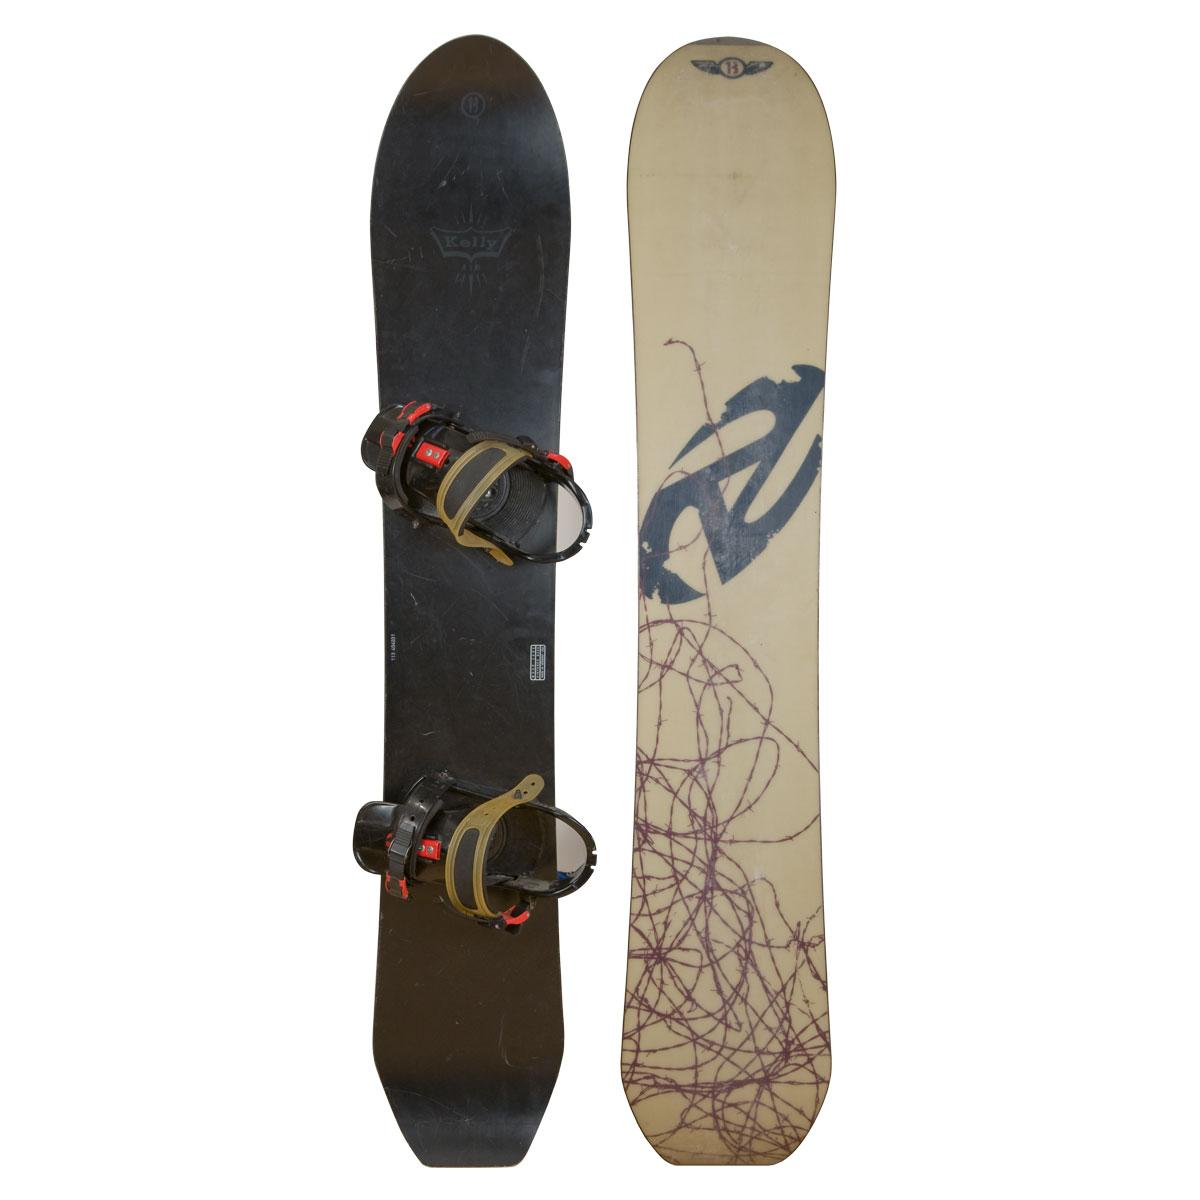 1995 Burton Craig Kelly vintage snowboard